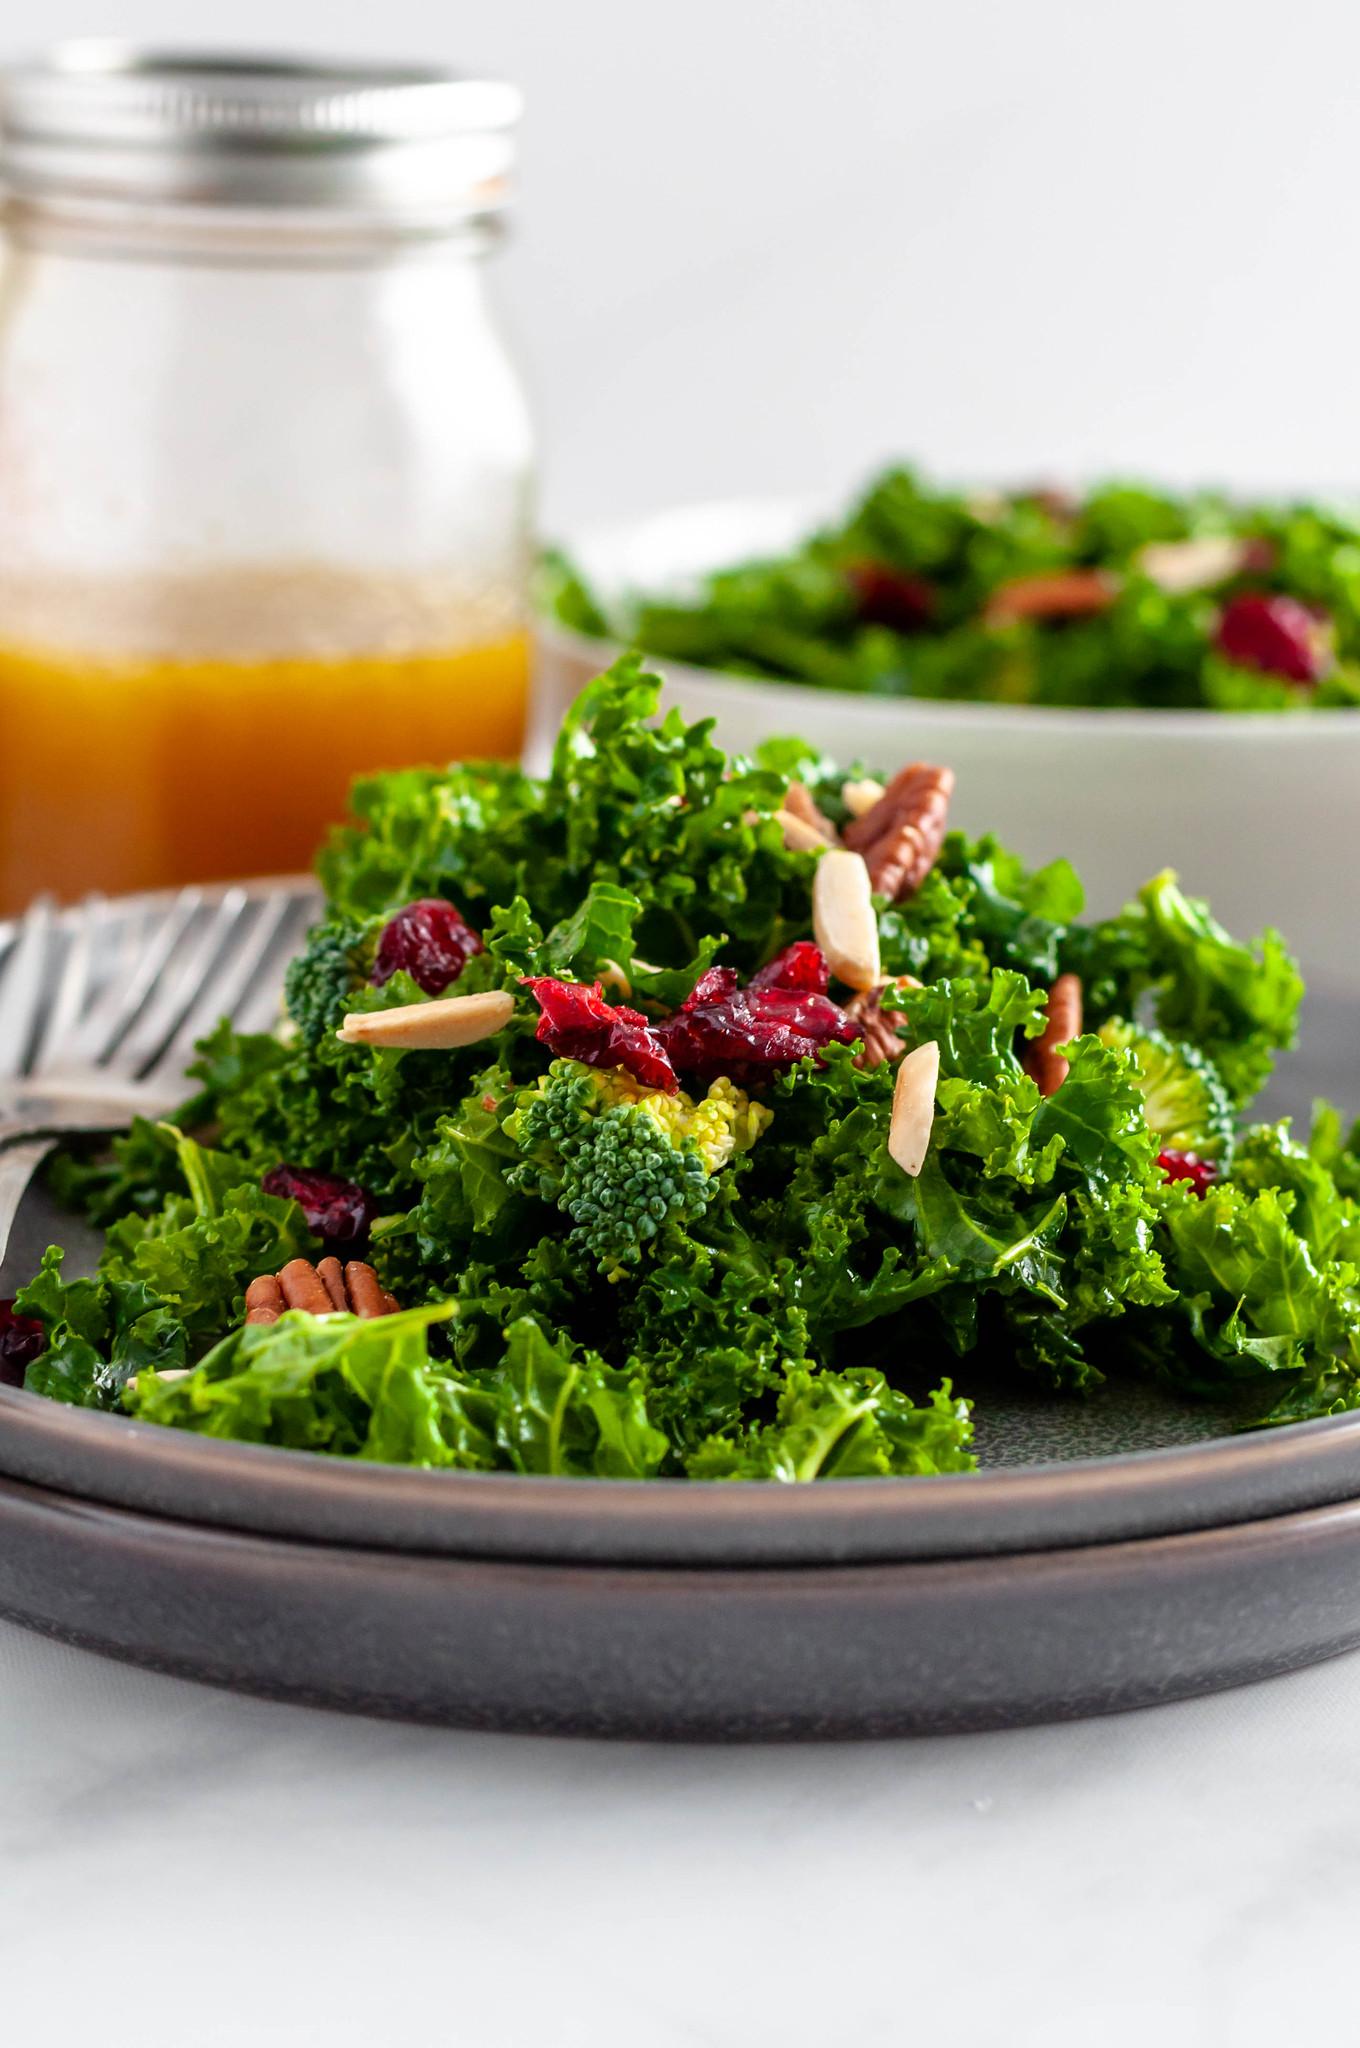 7 Delicious Copycat Restaurant Salad Recipes